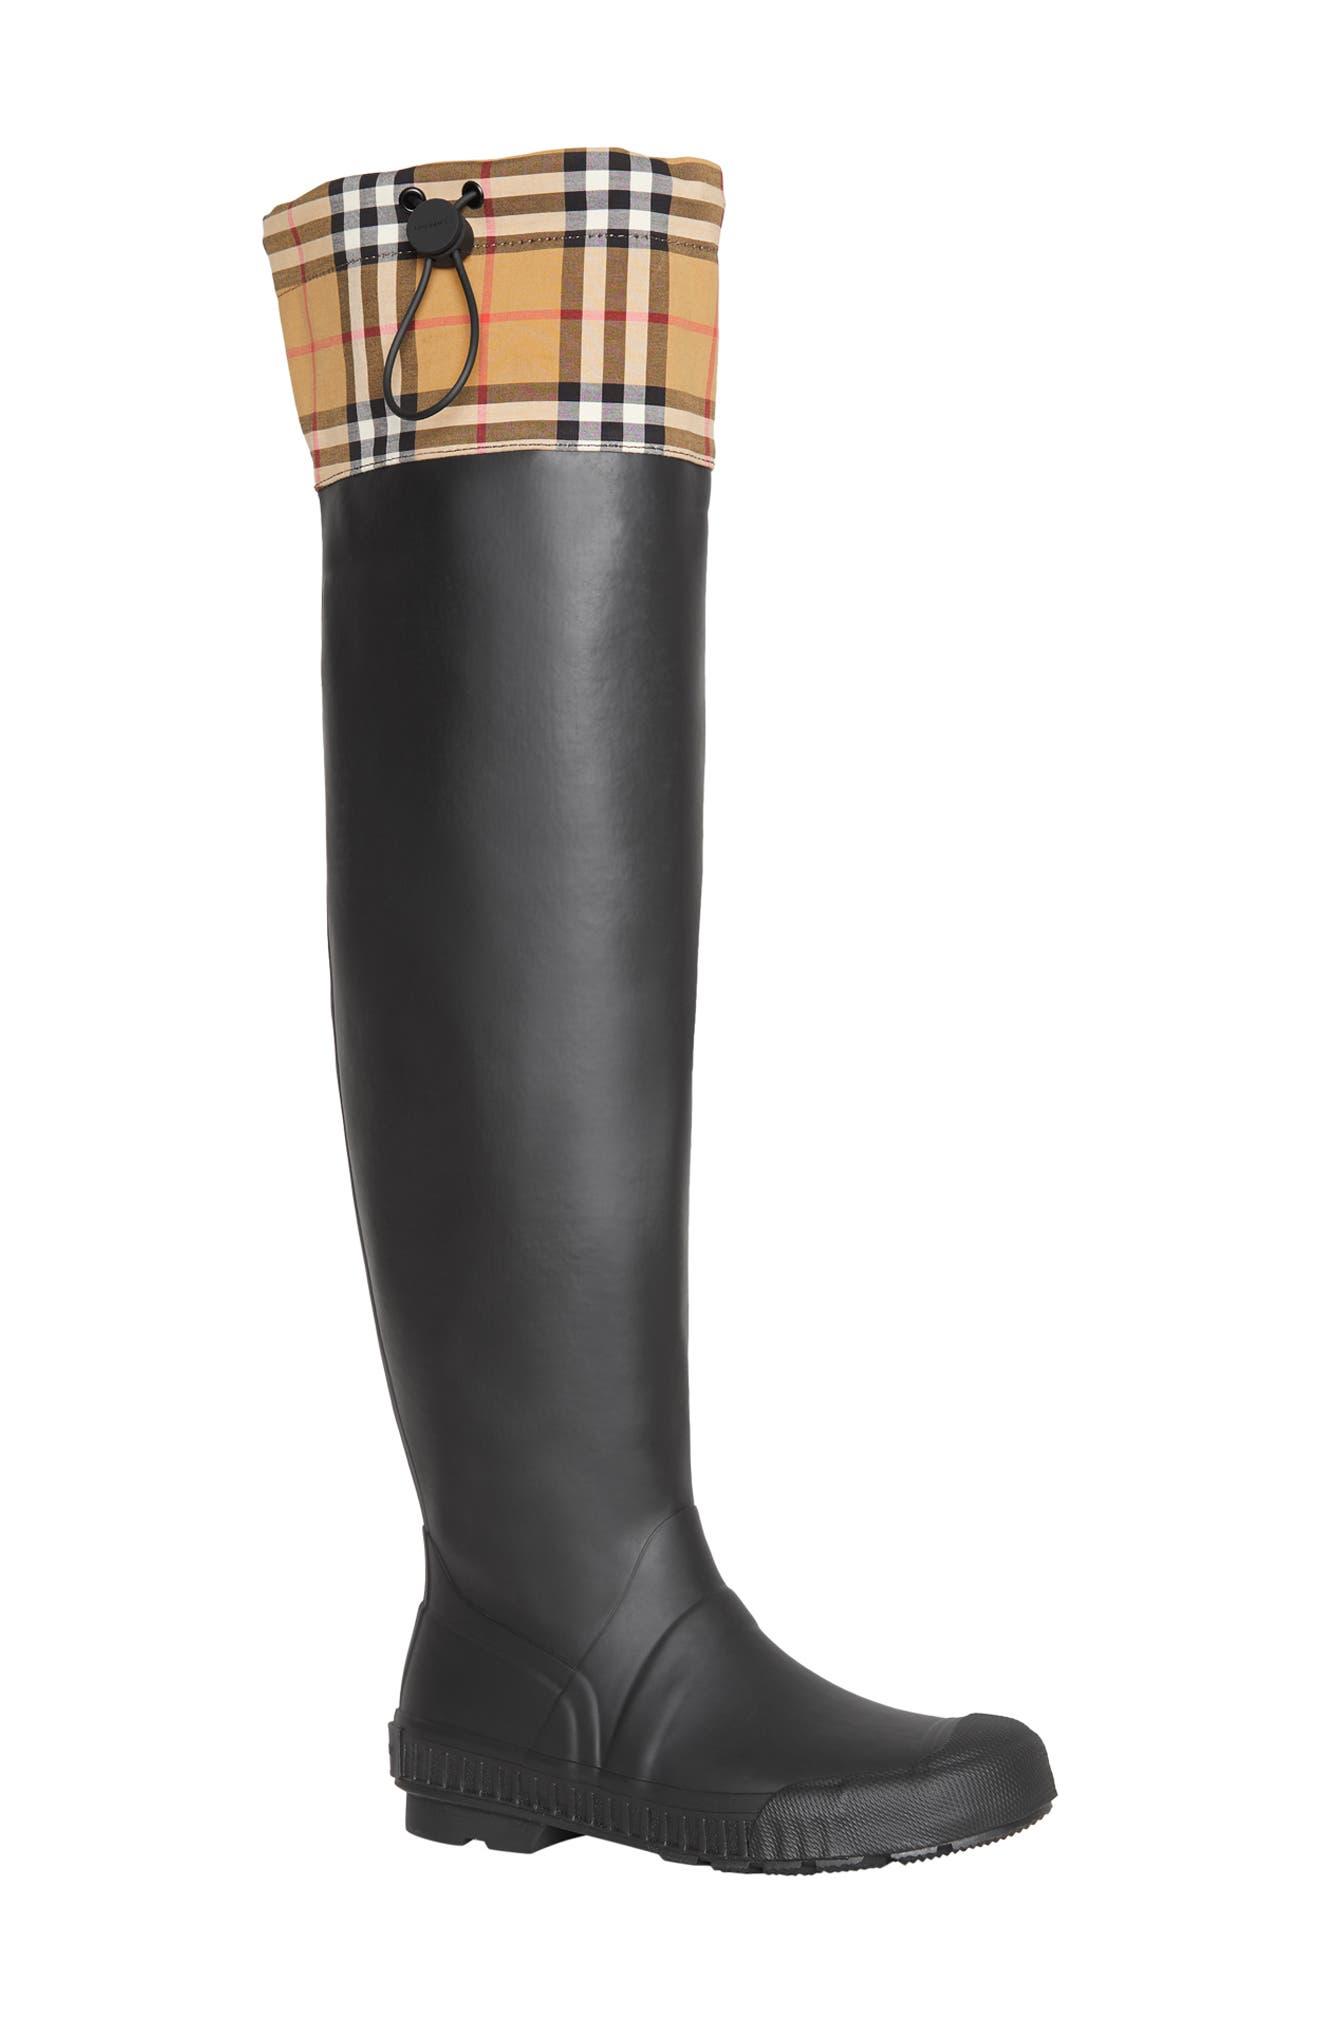 Burberry Freddie Tall Waterproof Rain Boot, Black